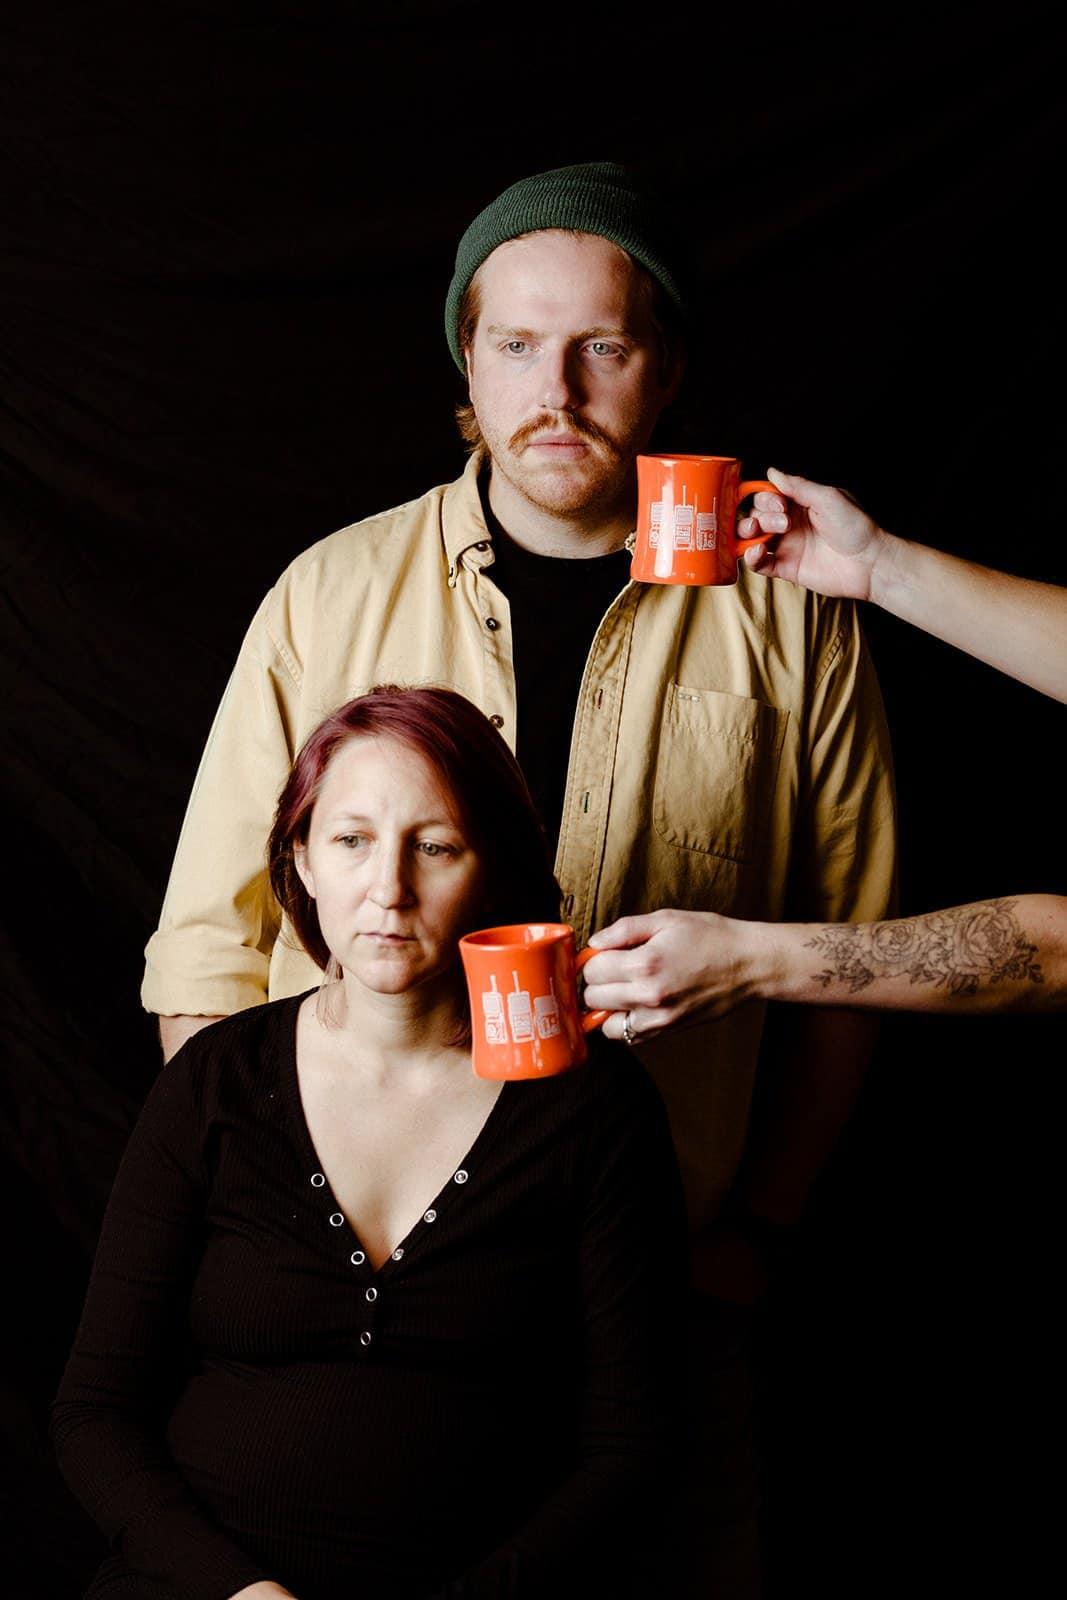 Coffee Shop Photography - Walkie Talkie Coffee 218